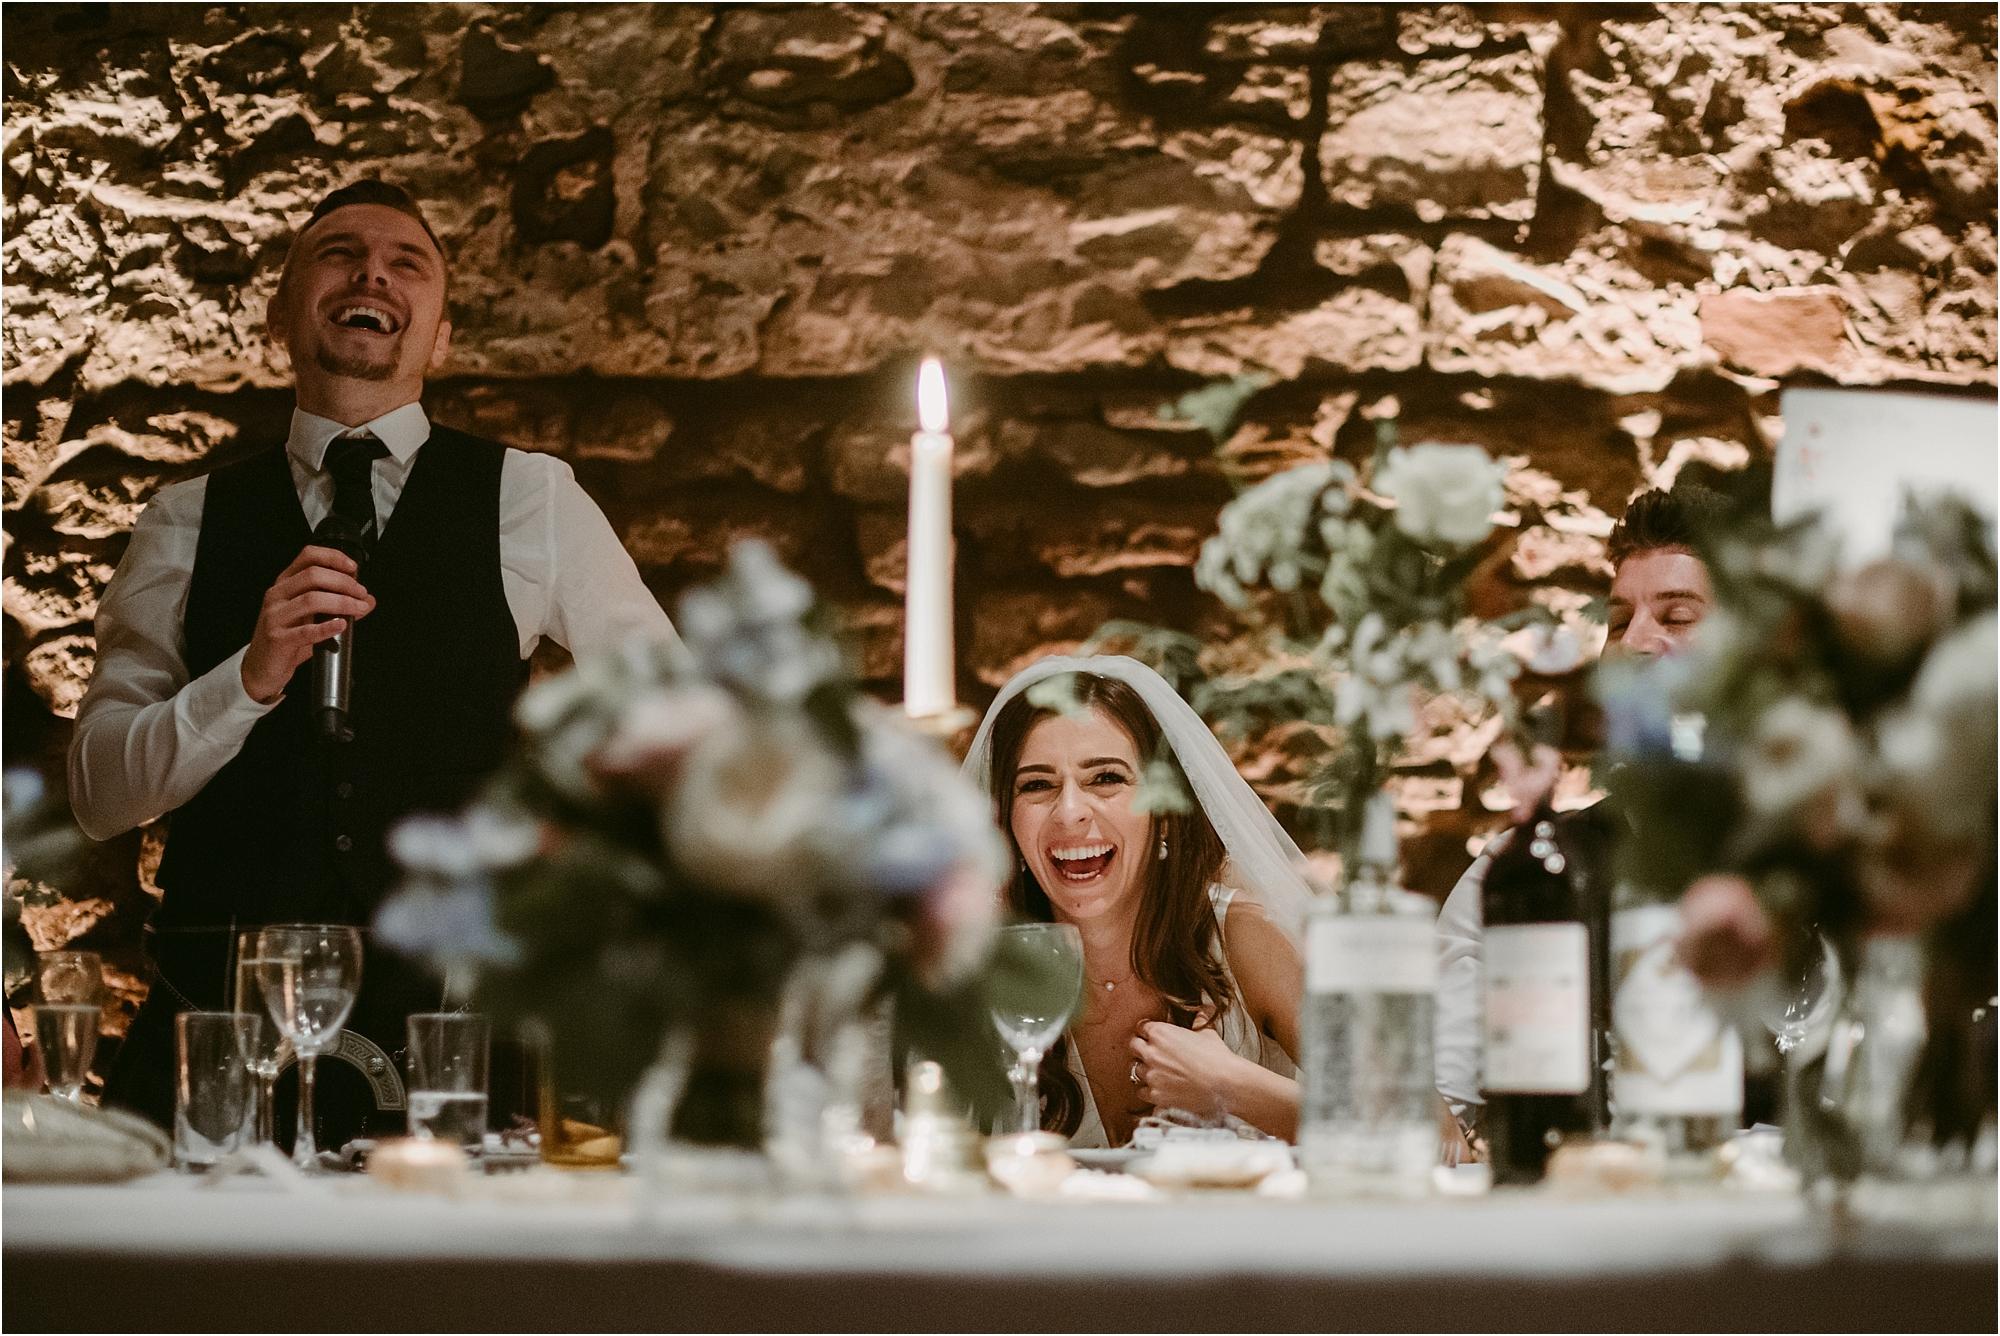 Scott+Joanna-Kinkell-Byre-wedding-fife-photography__0085.jpg